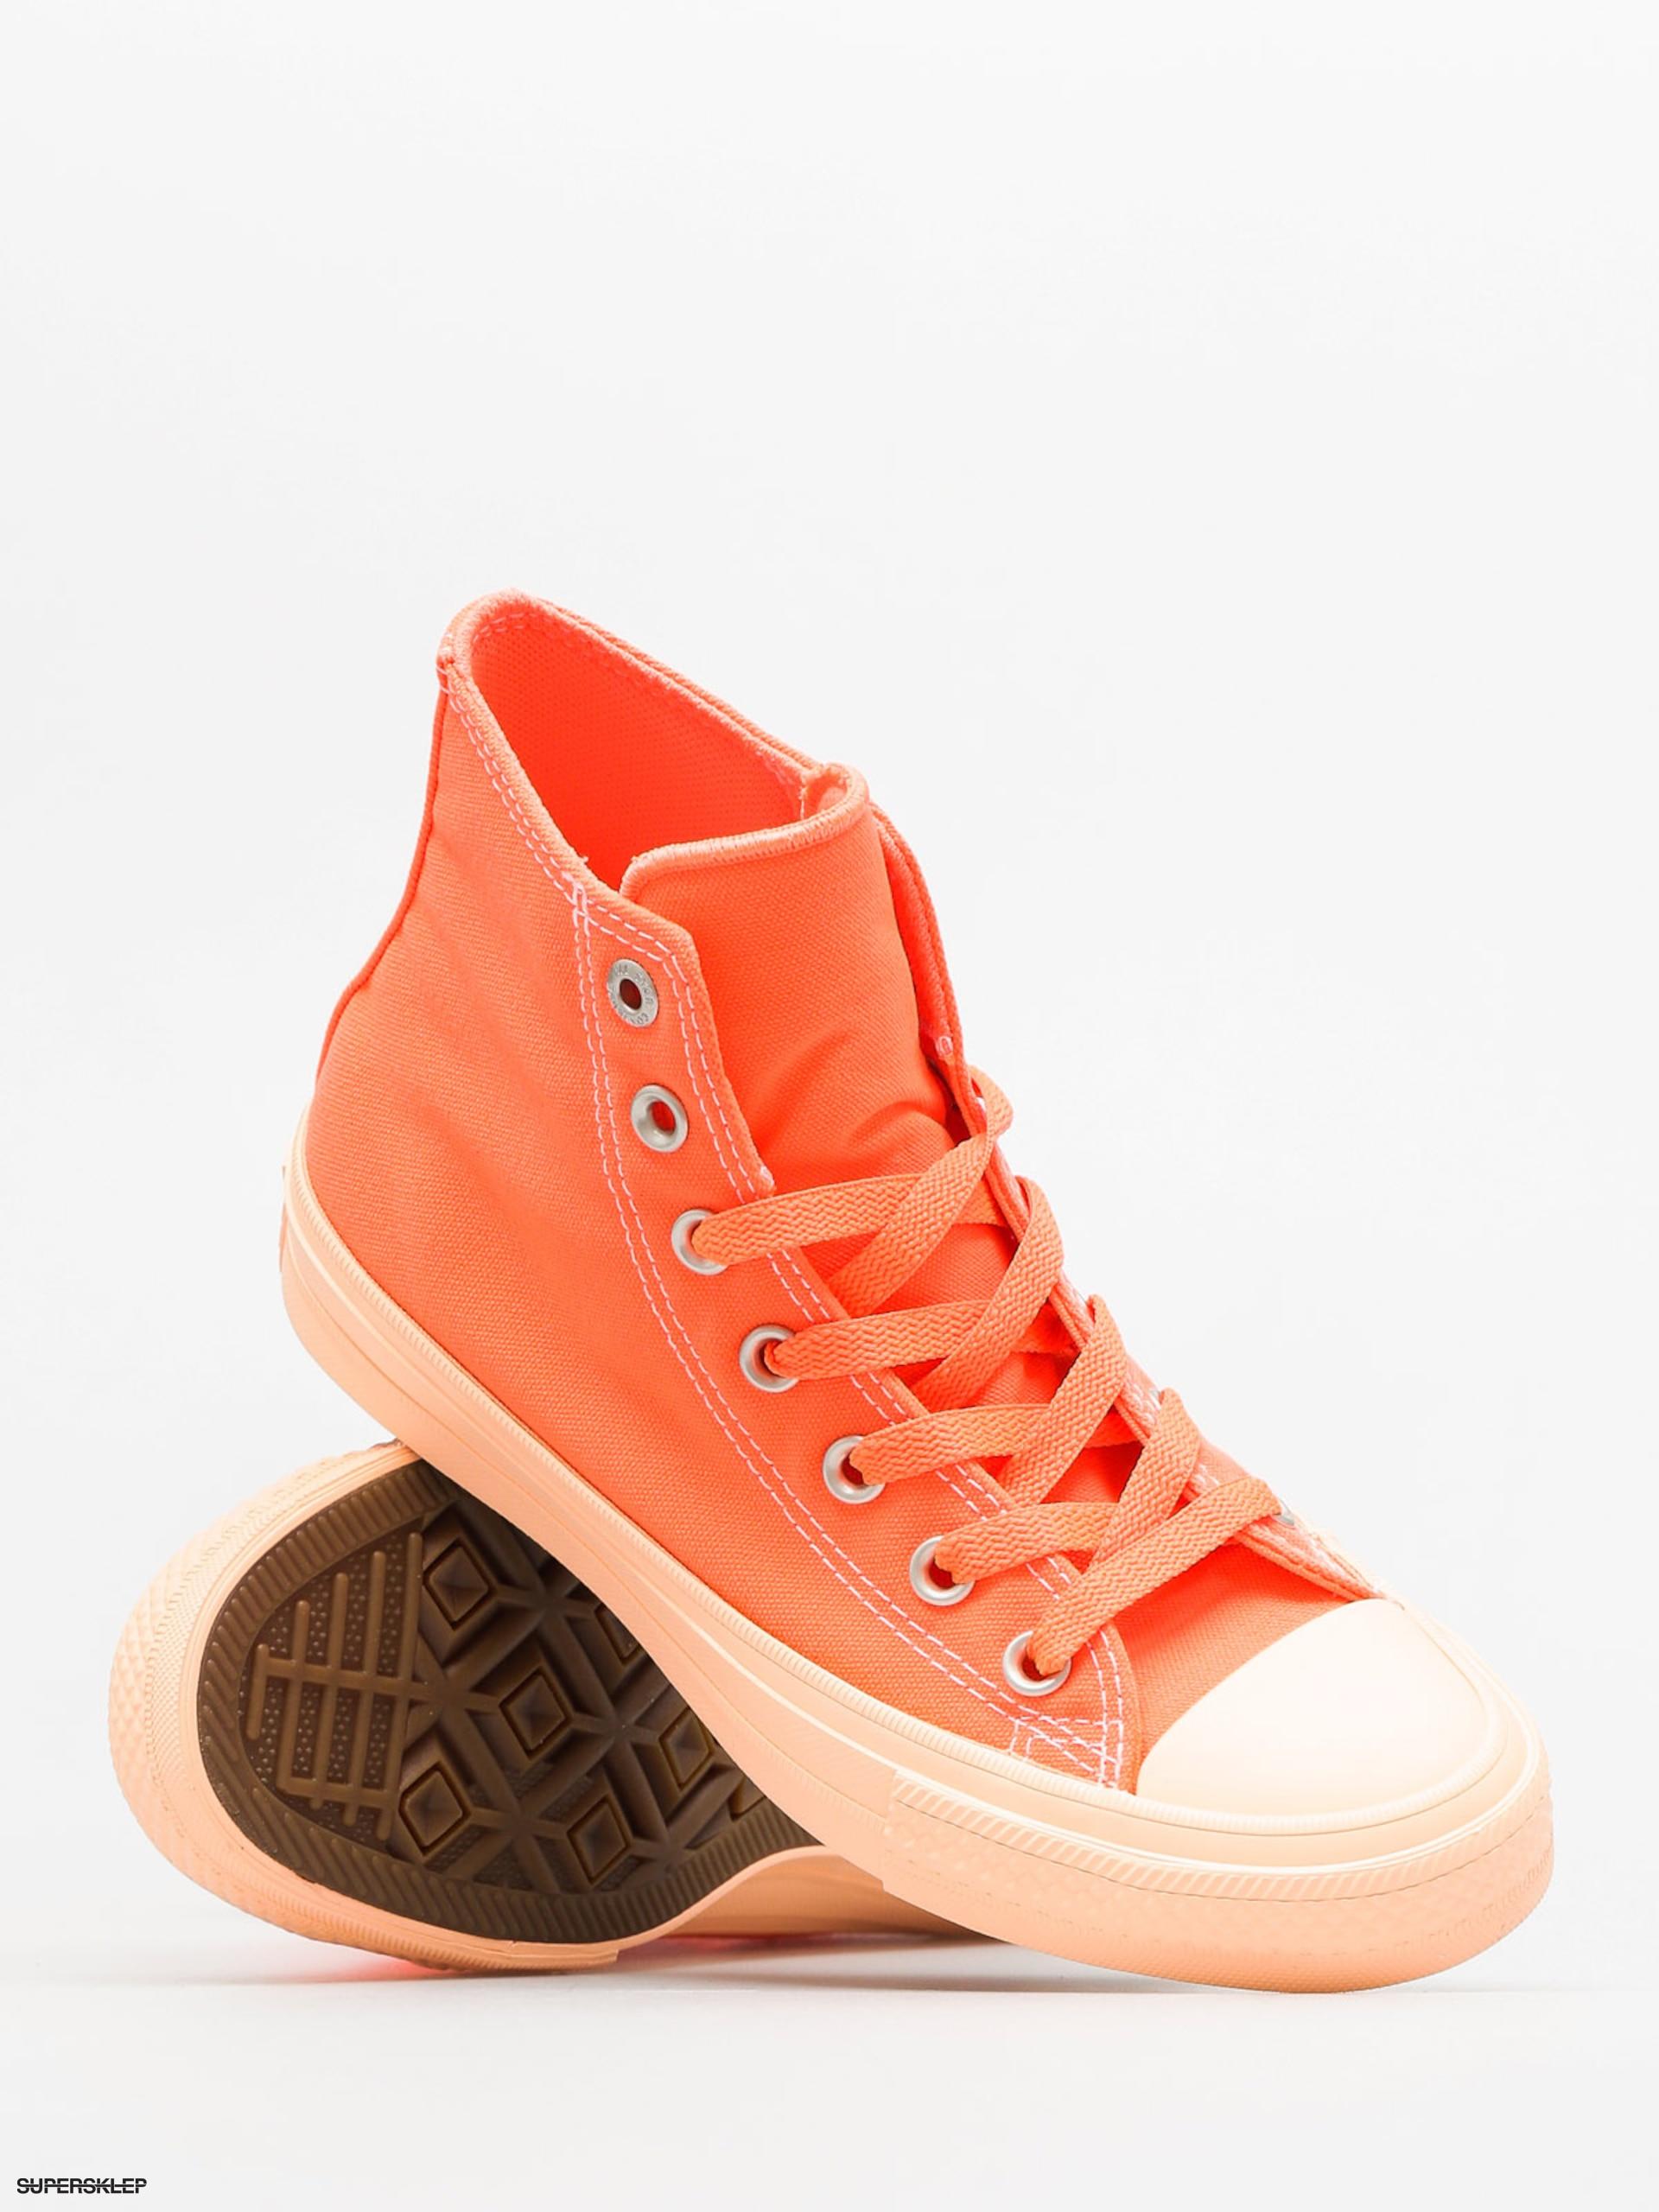 97dcb9545442 Tenisky Converse Chuck Taylor All Star II Hi (hyper orange sunset glow)